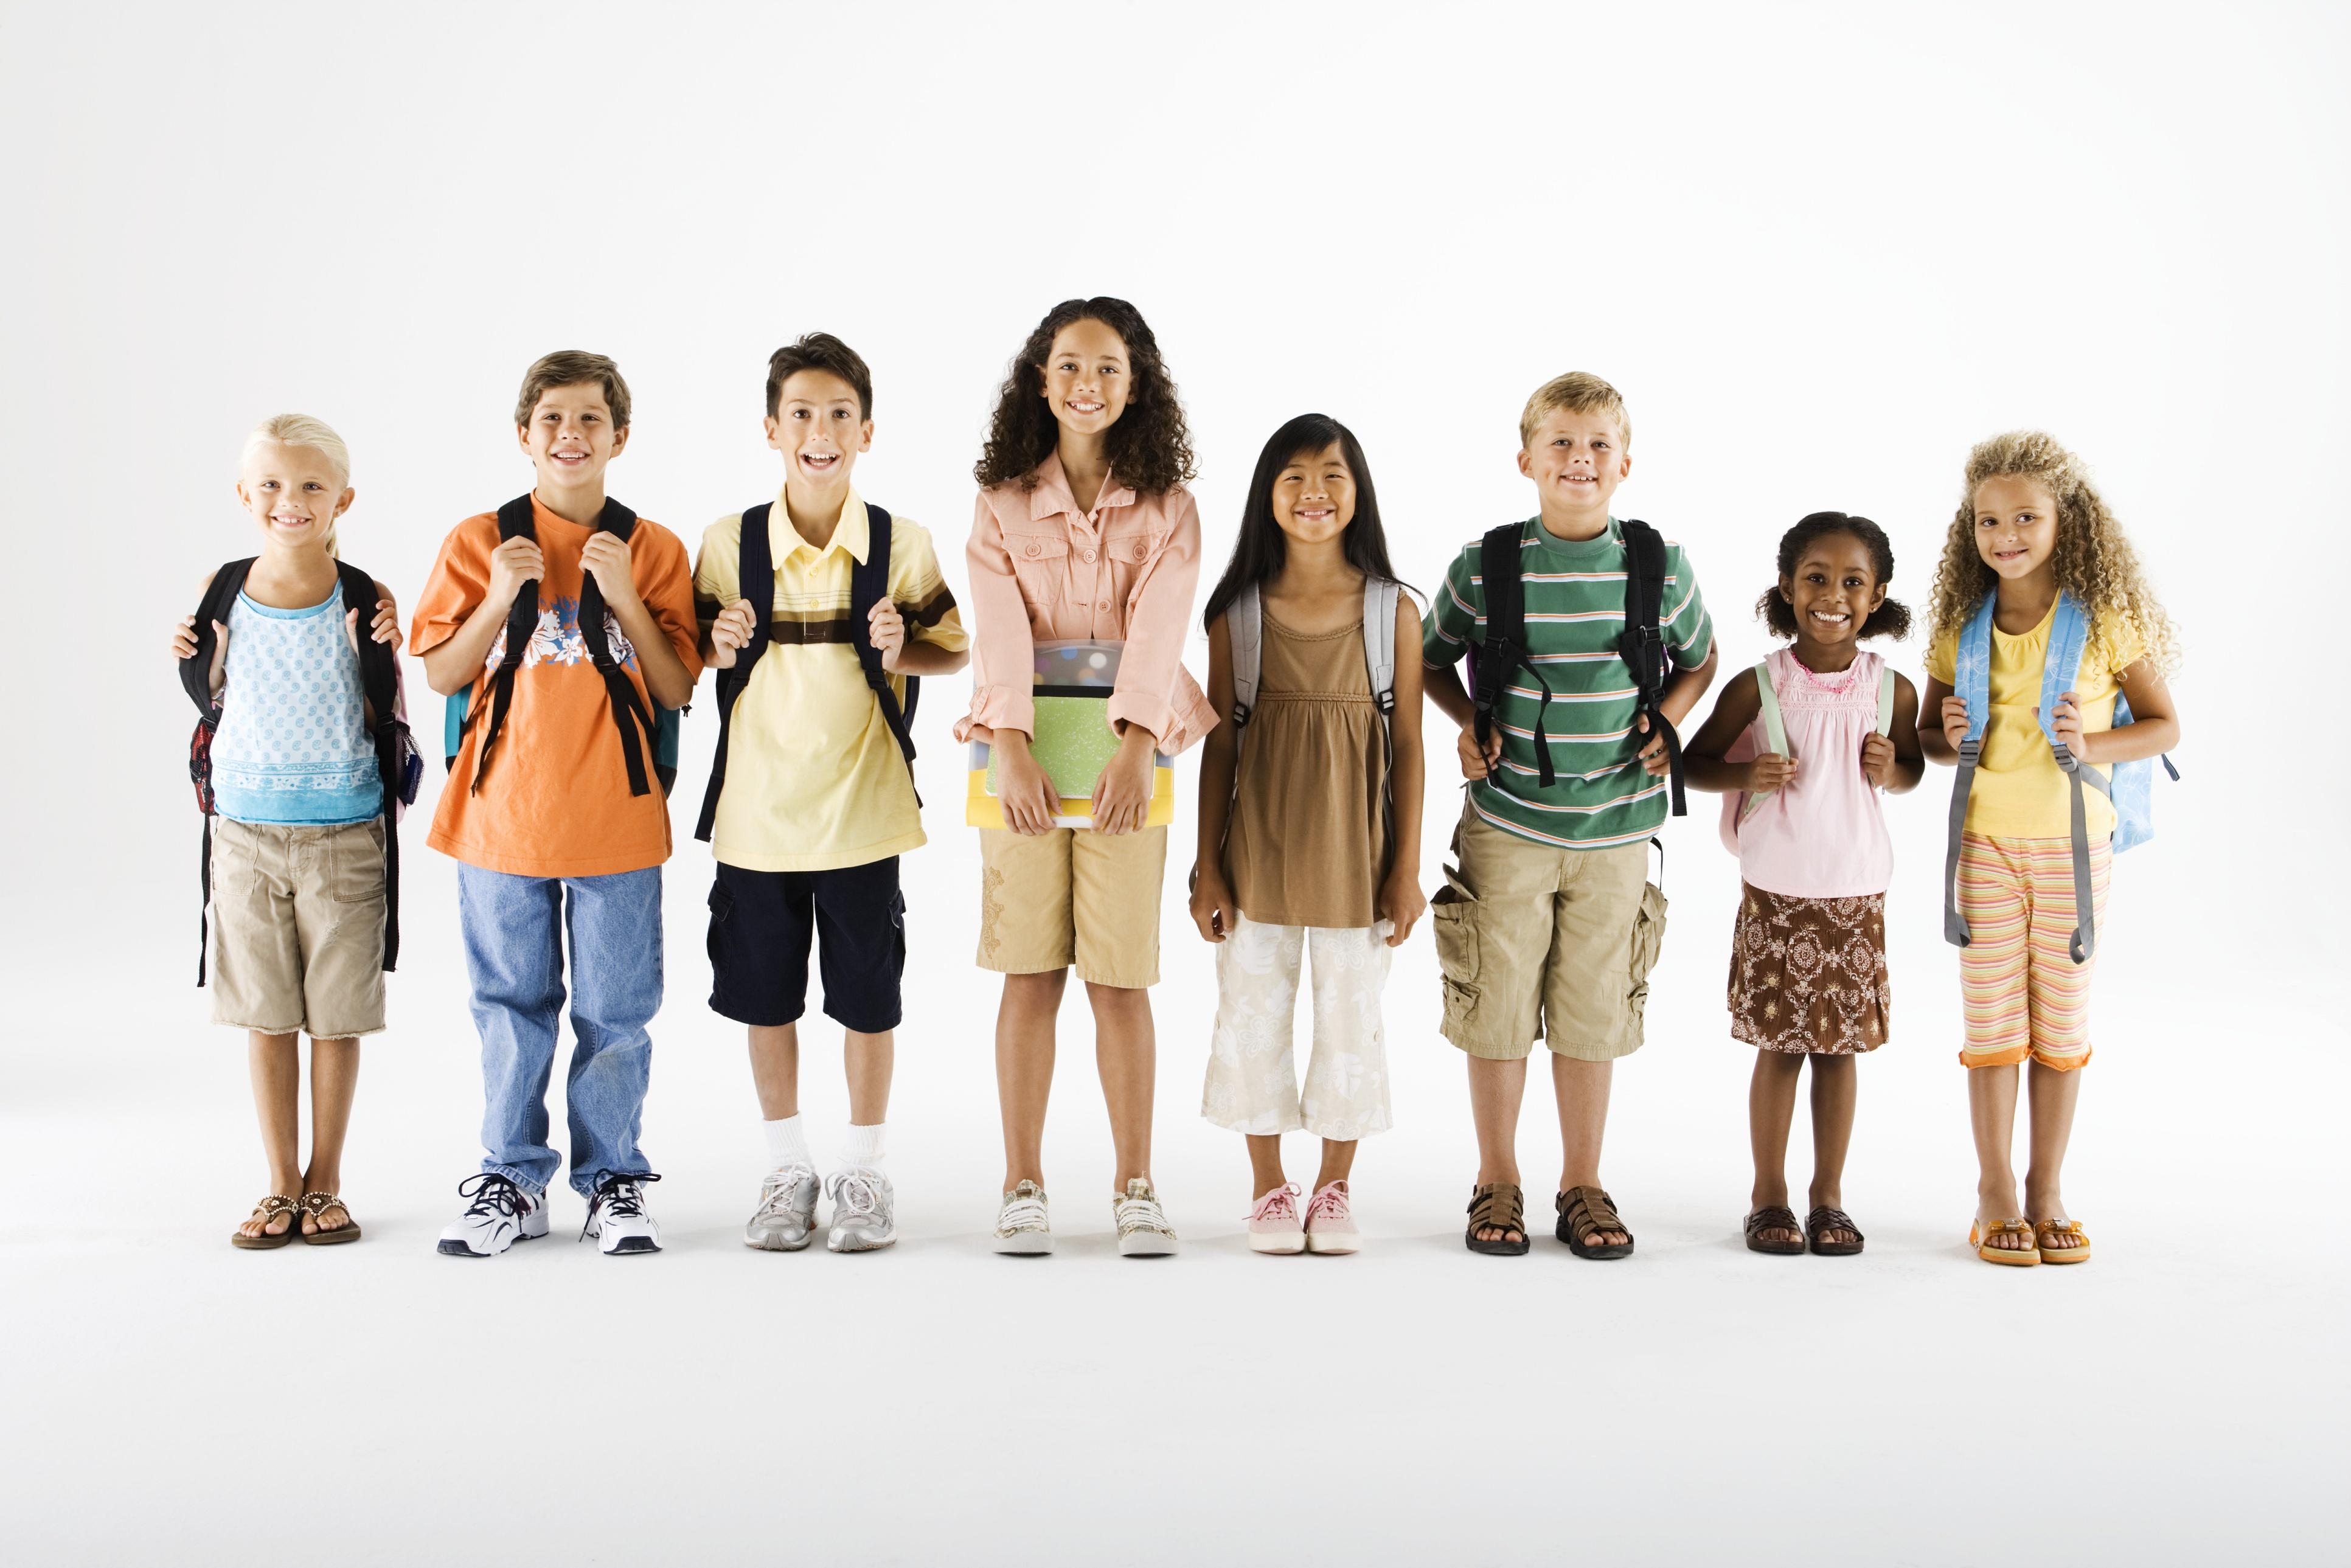 Sex Education: Public School Sex Education Negative Approach